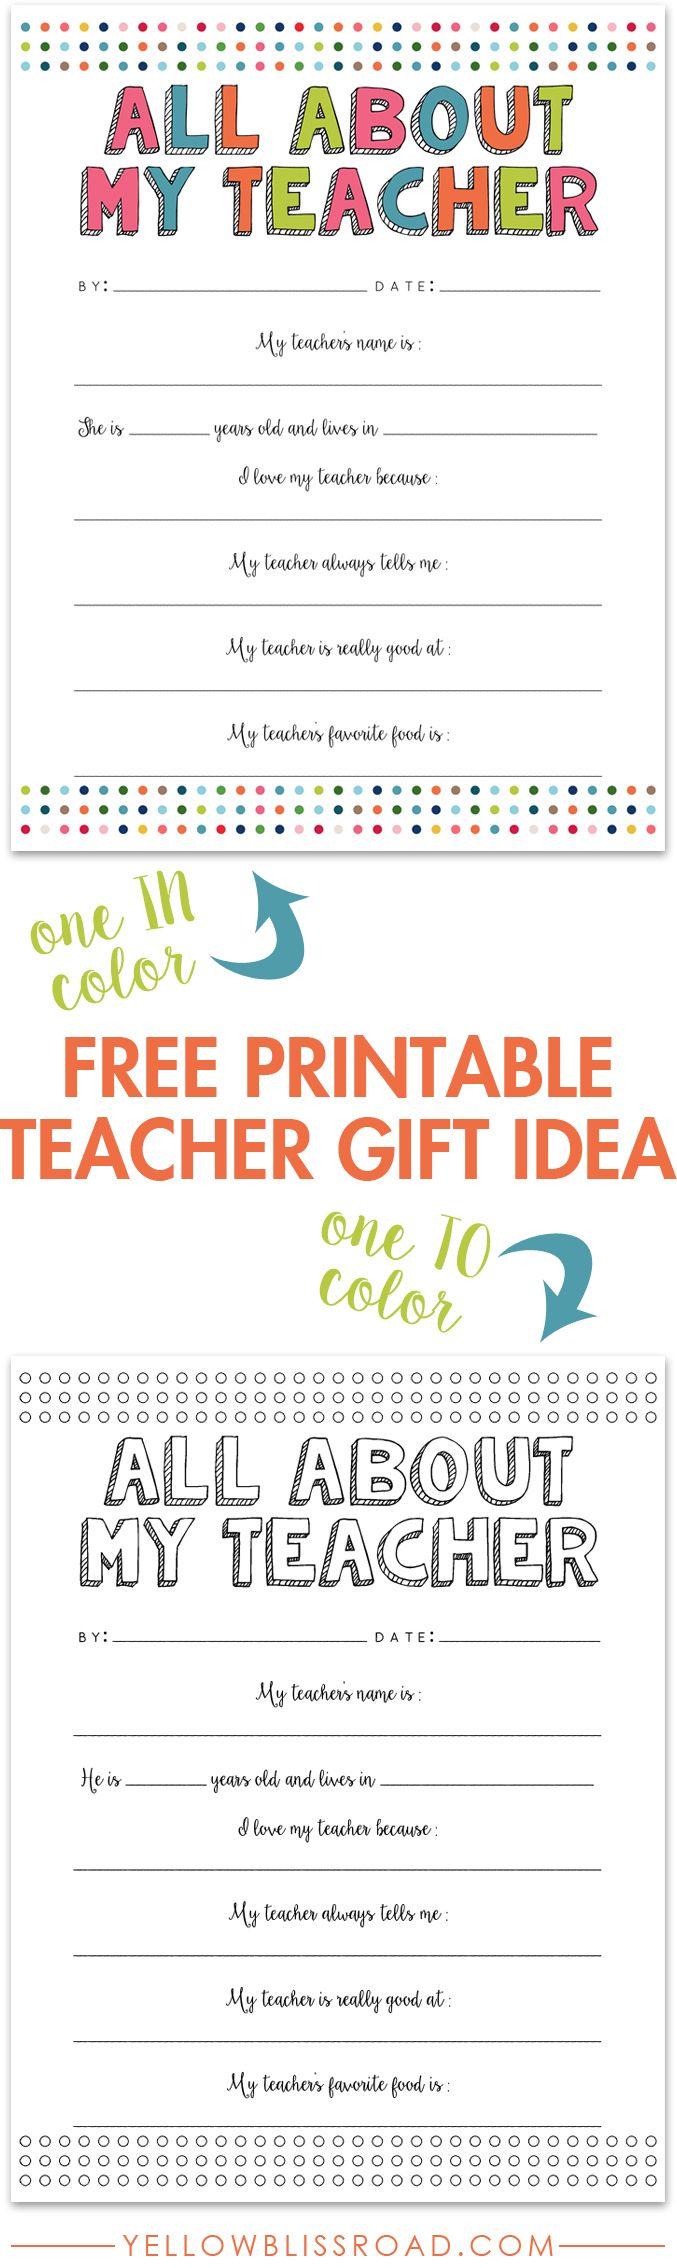 All About My Teacher Free Printable | Free printable